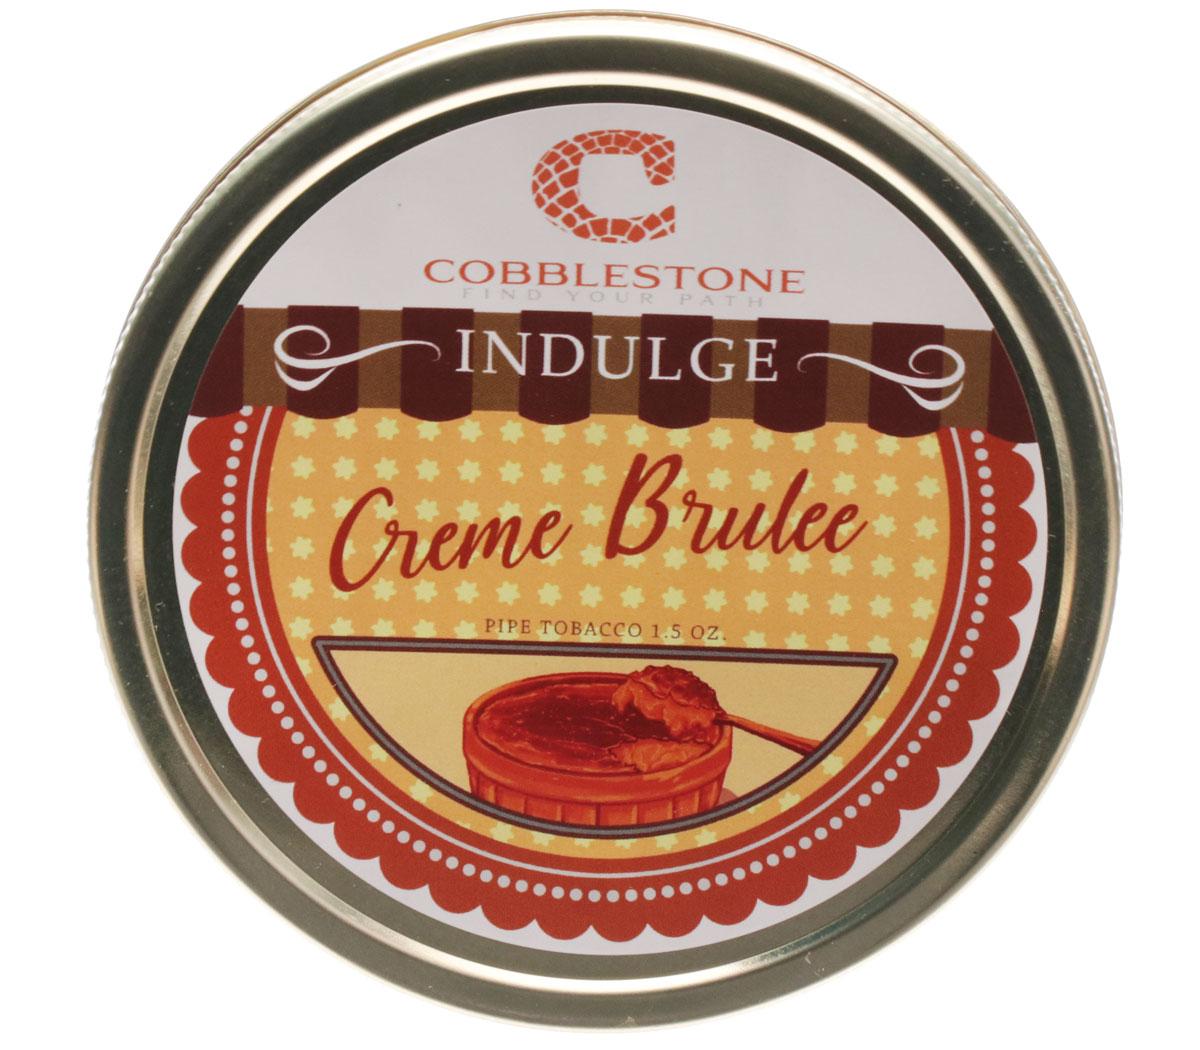 Cobblestone Indulge Creme Brulee 1.75oz